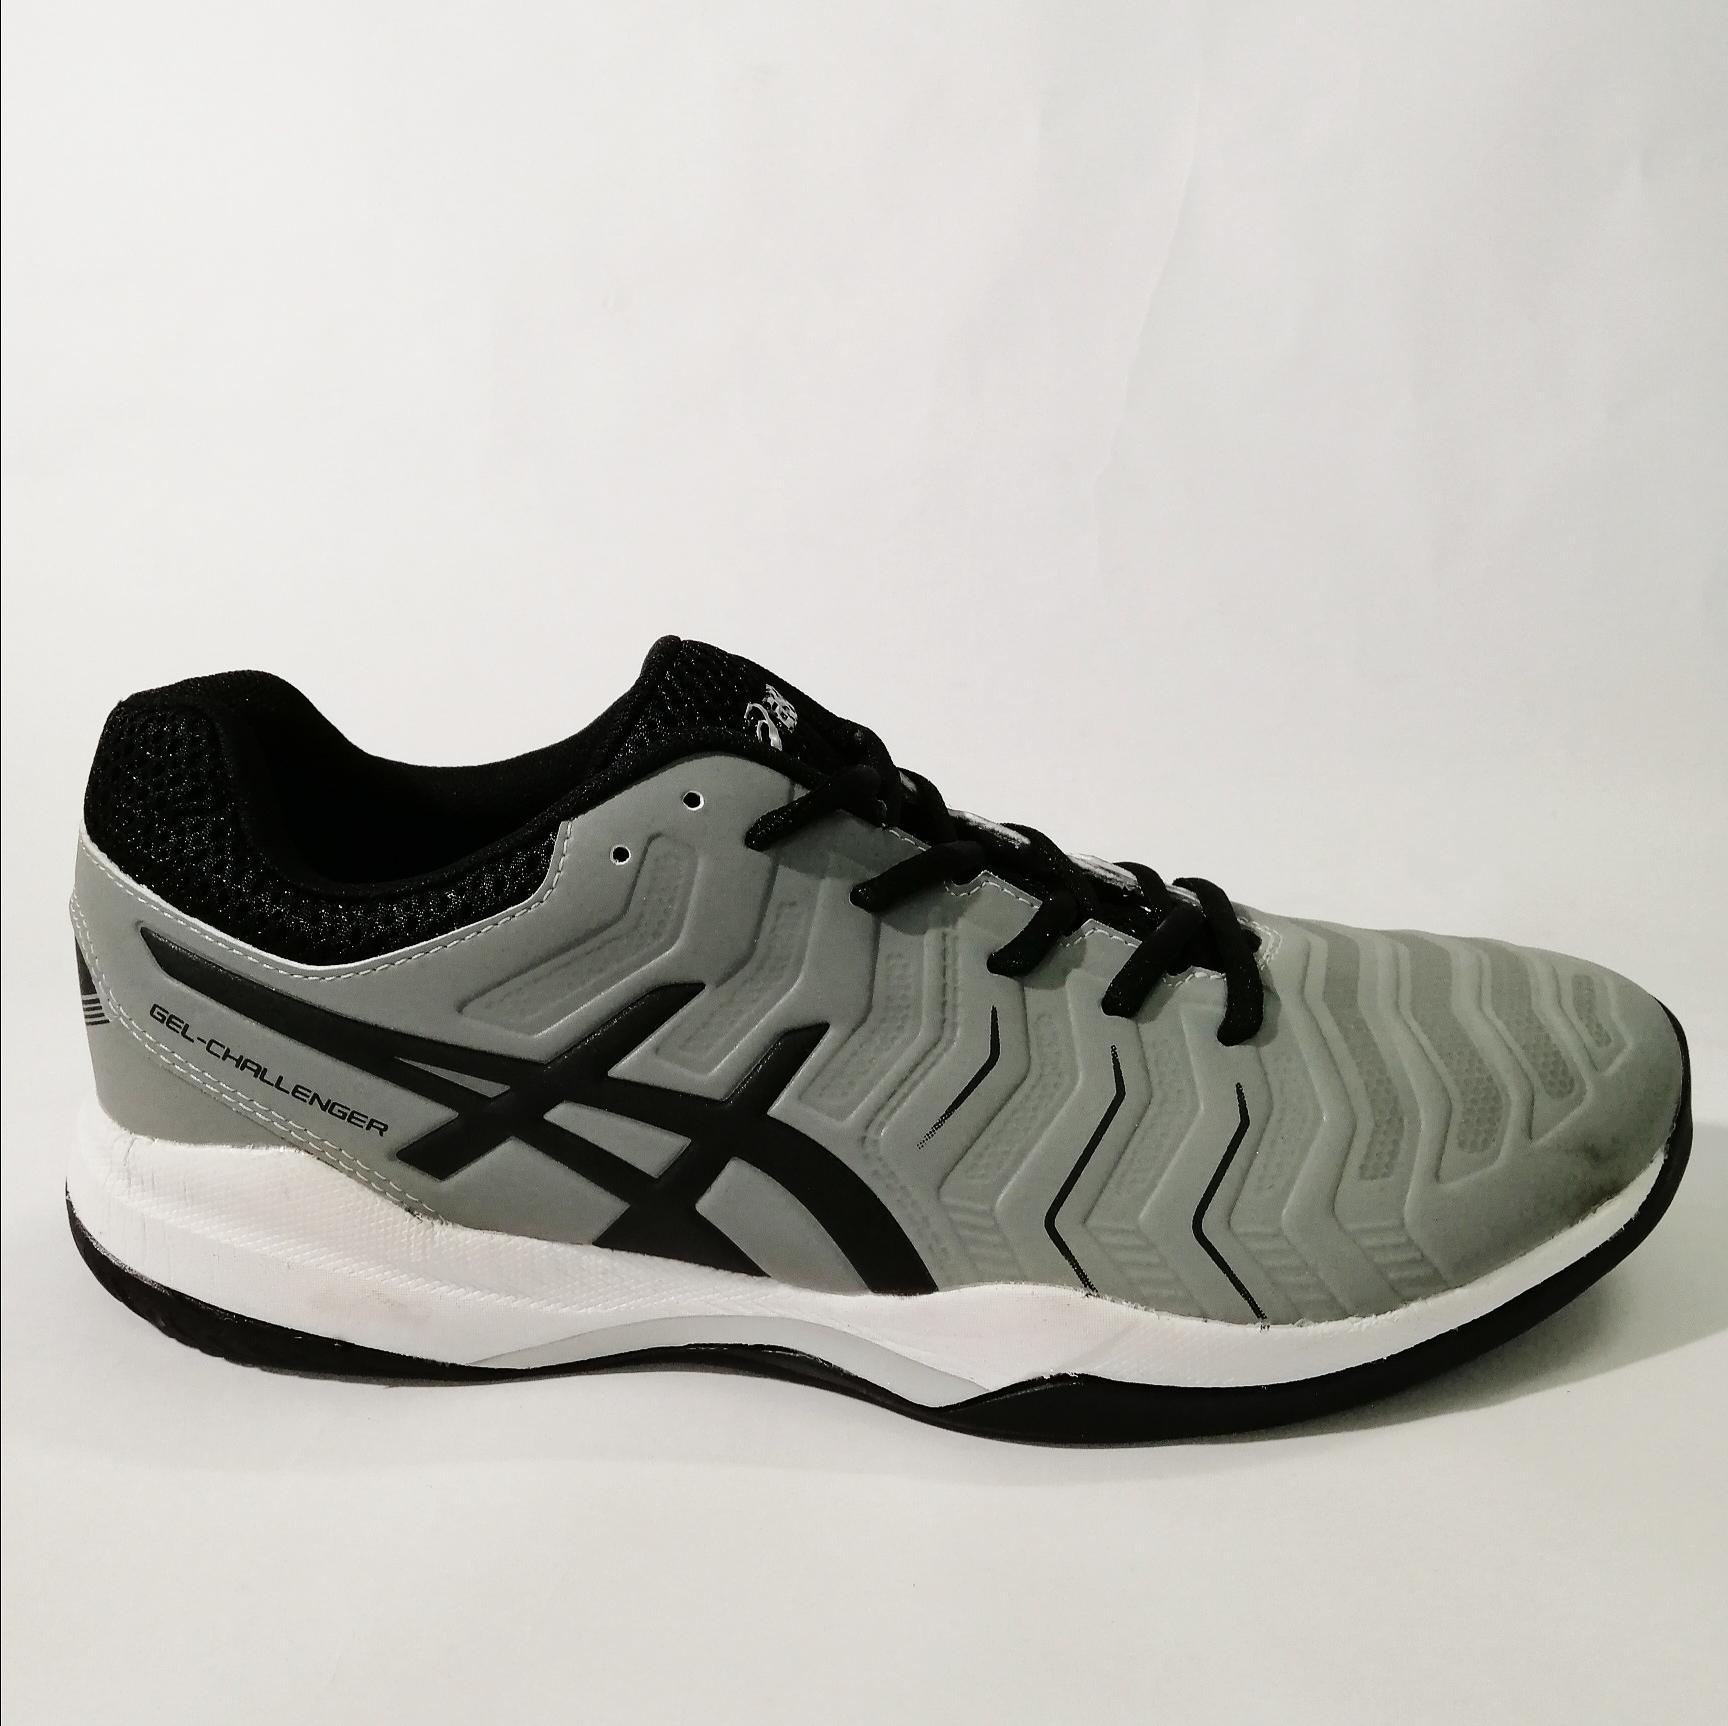 giày asics tennis 40 41 42 43 44 45